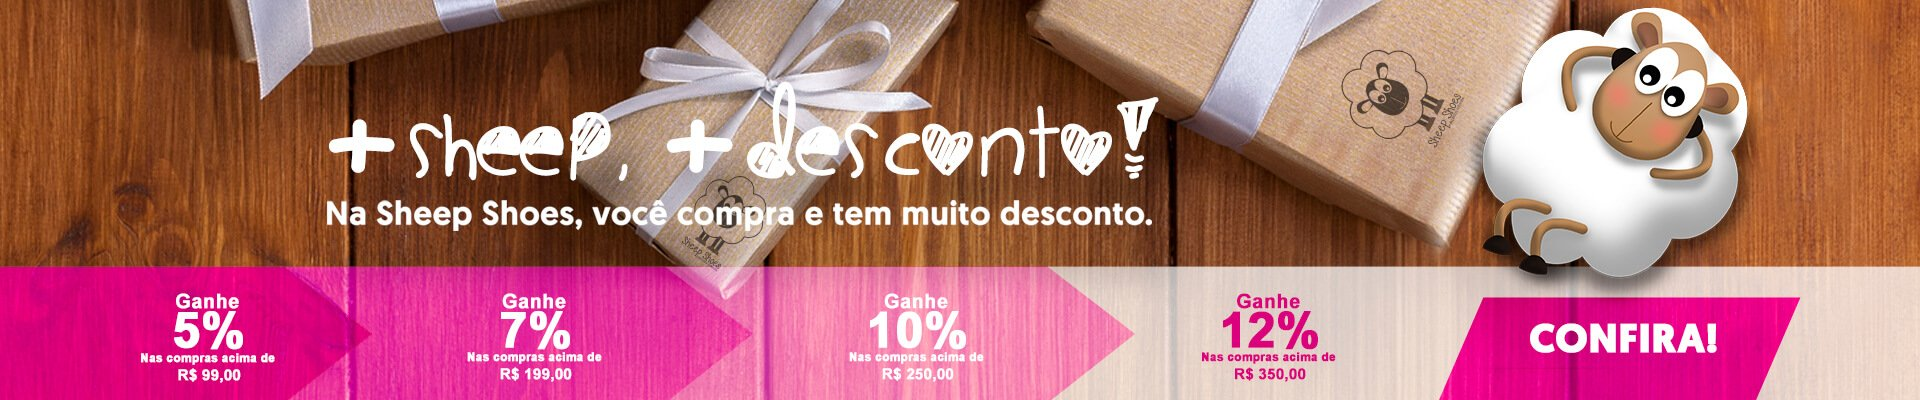 Campanha: + Sheep + Desconto